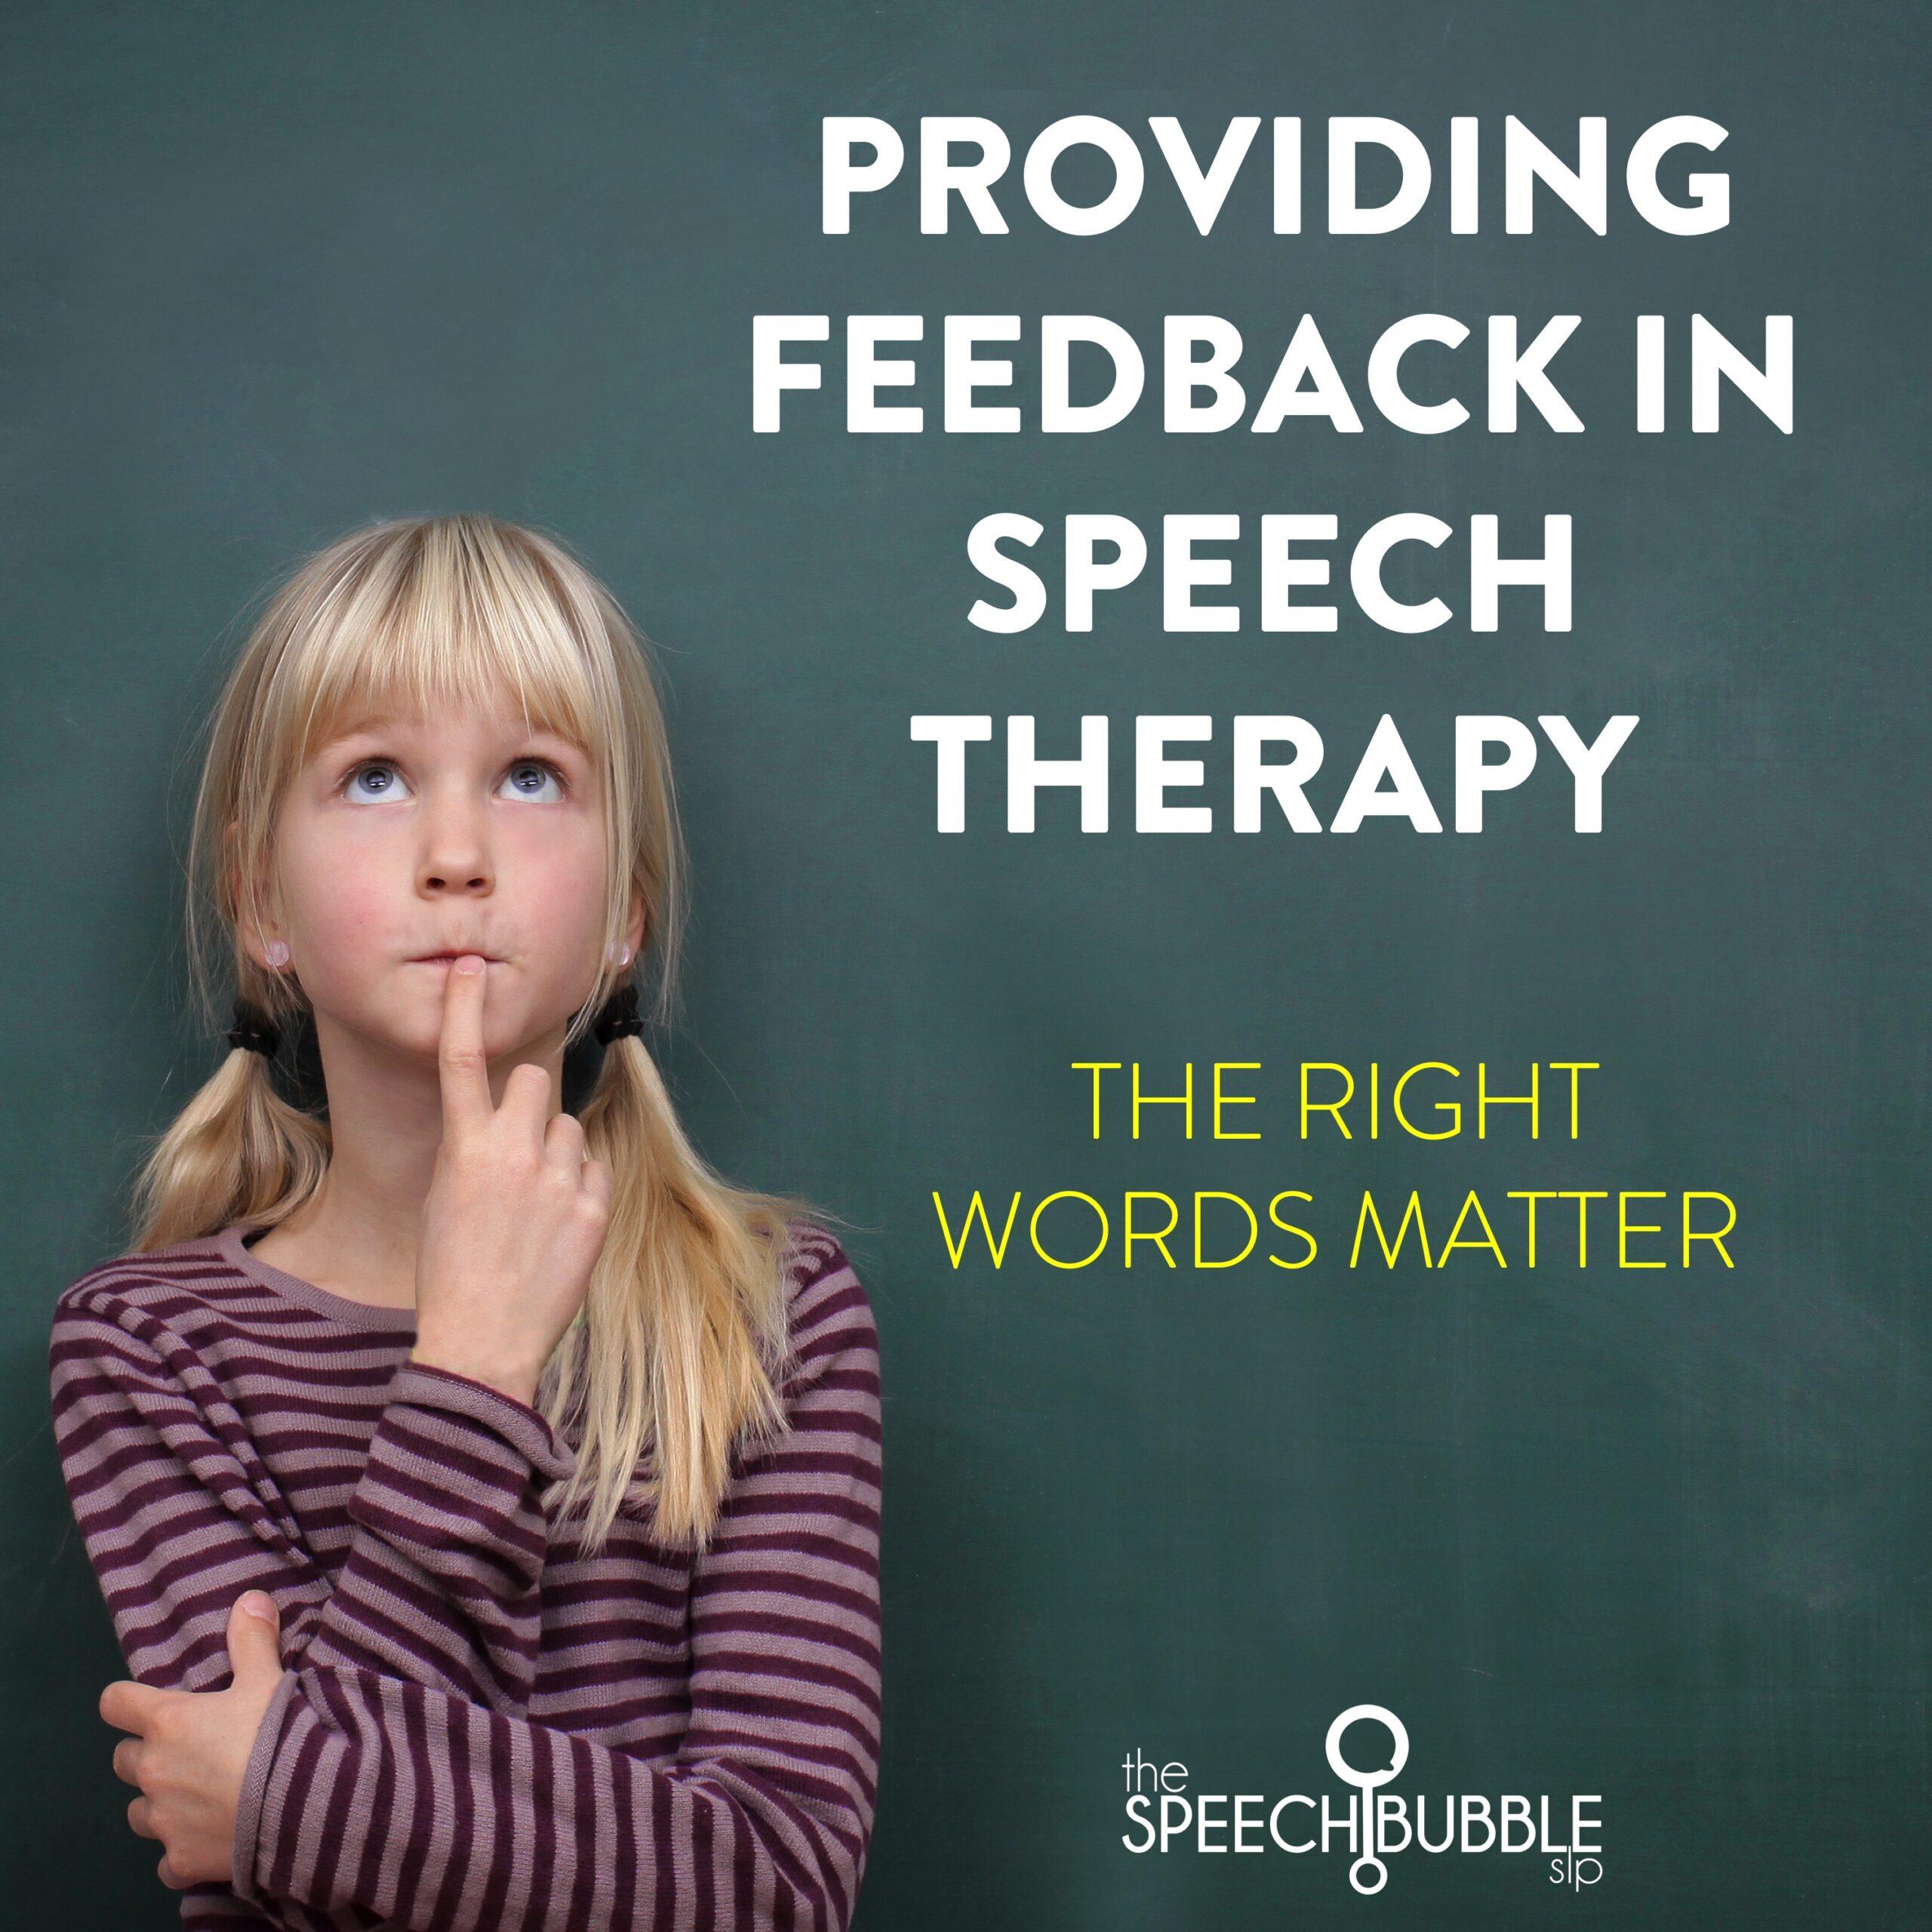 Providing Feedback in Speech Therapy